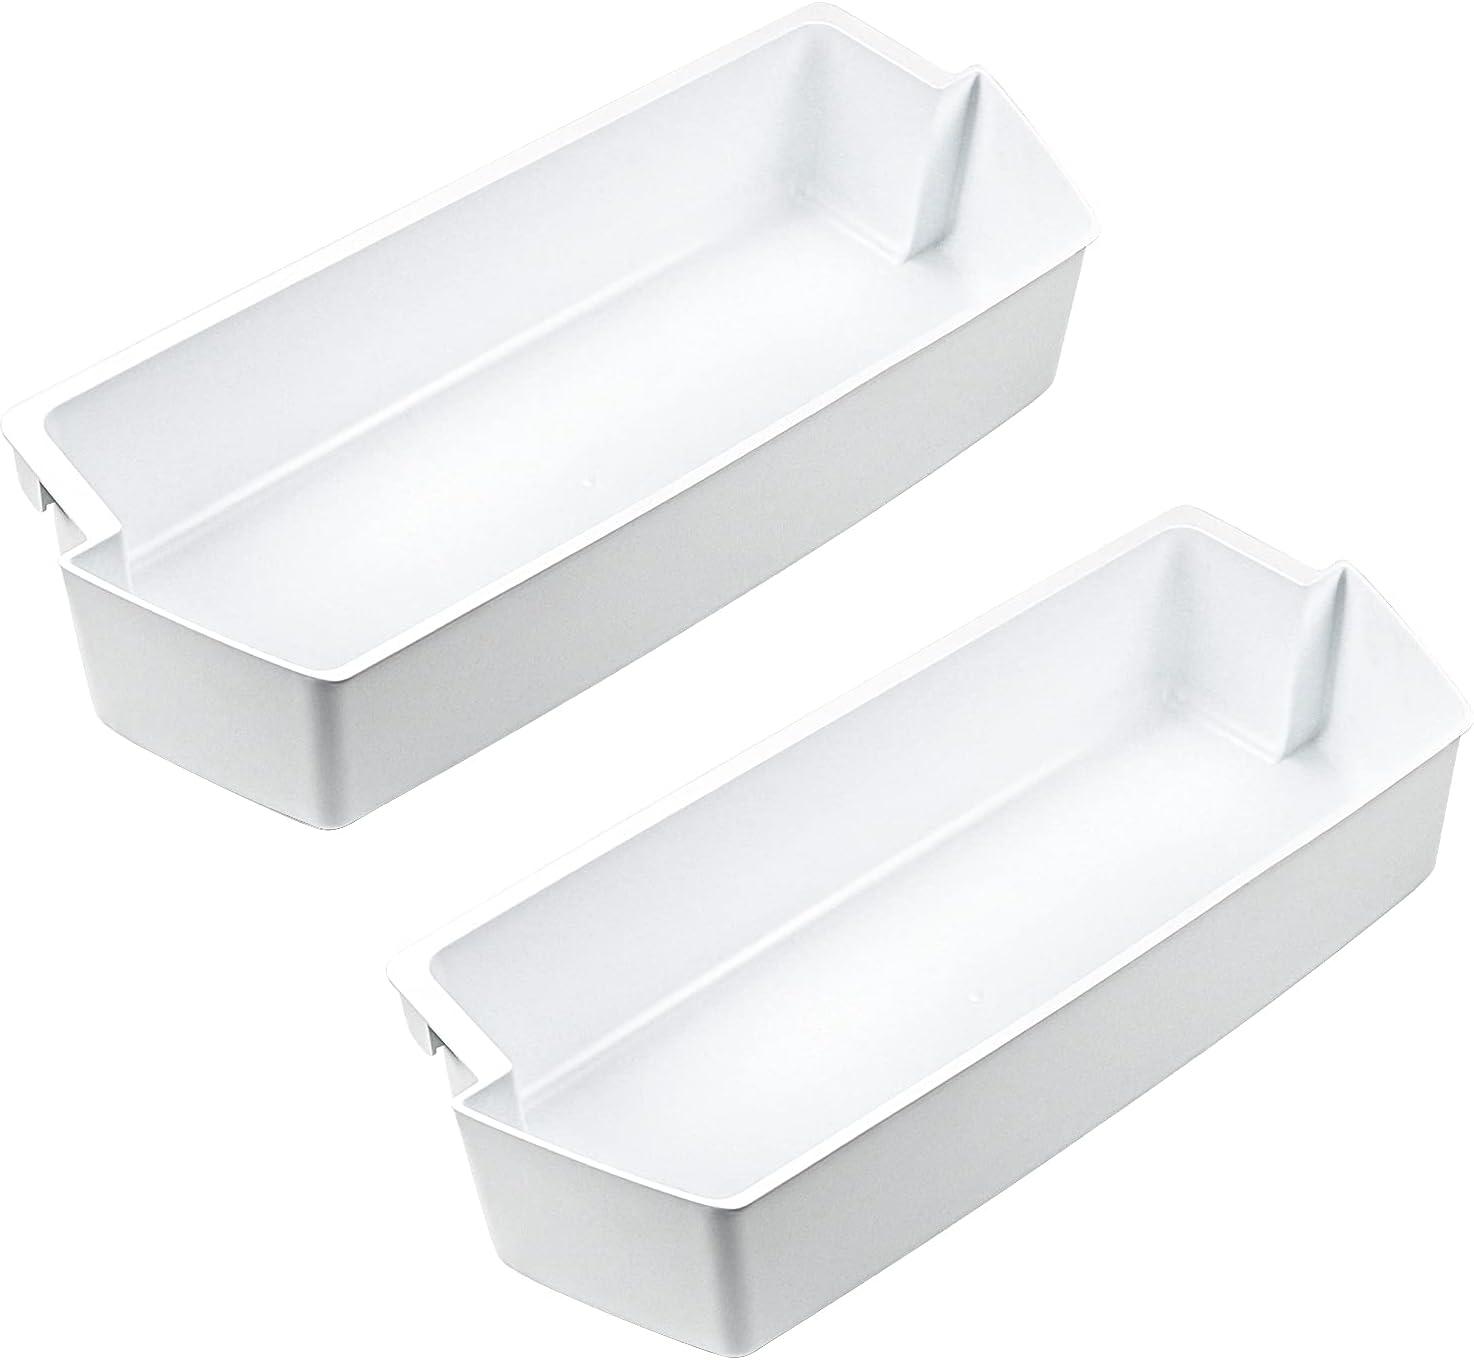 Cenipar service 2187172 Refrigerator Door Replacement Bin Shelf New Shipping Free Compatib